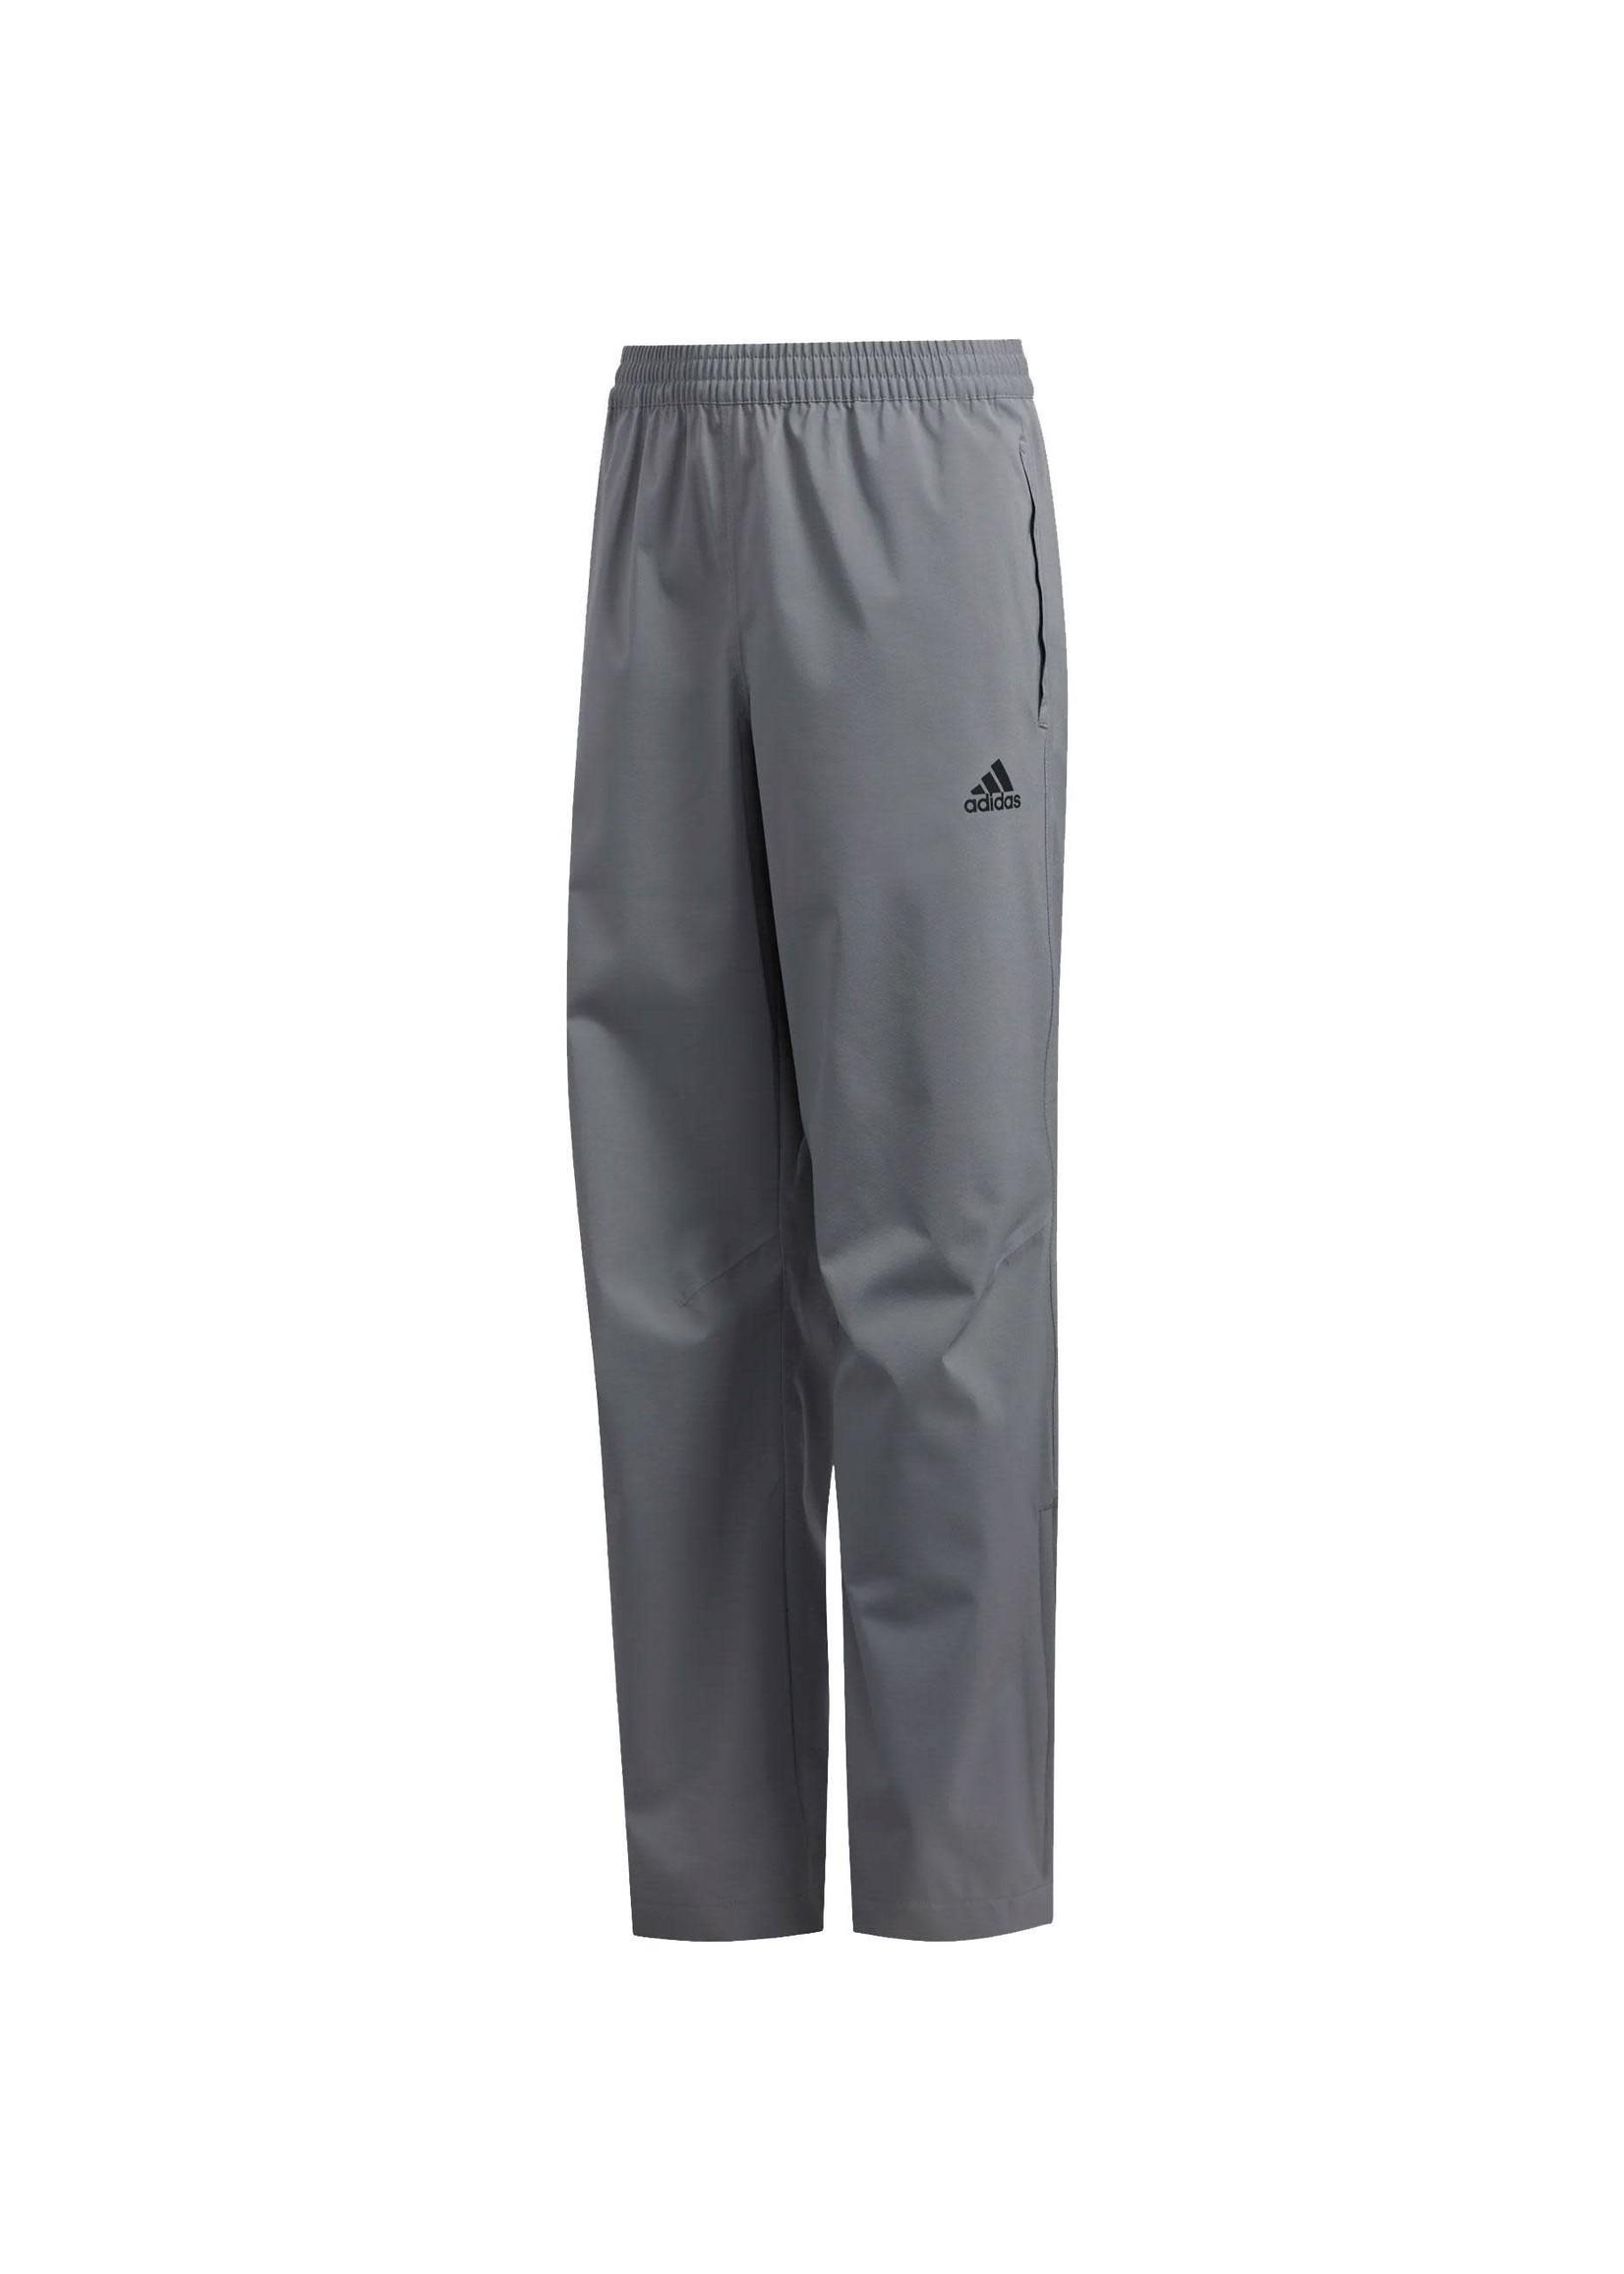 Adidas Adidas Boys Provisional Waterproof Pant